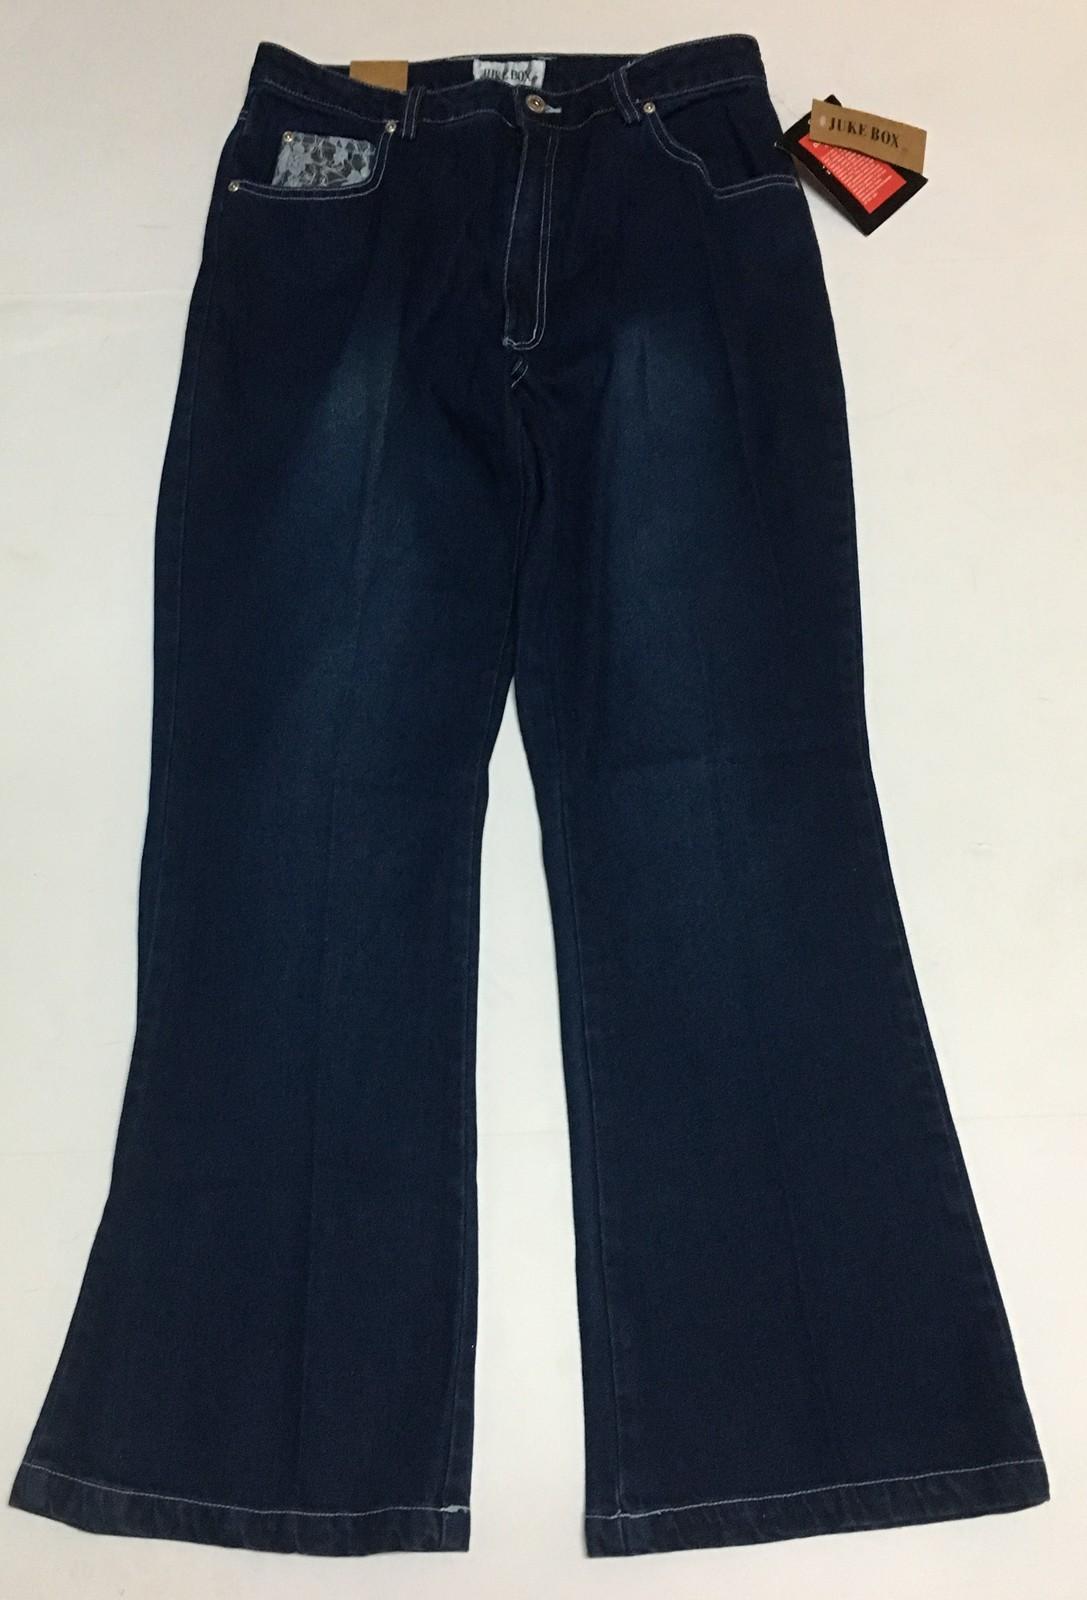 Juke Box Dark Indigo Denim Jeans Sz 11 Blue Lace Hearts NWT image 2